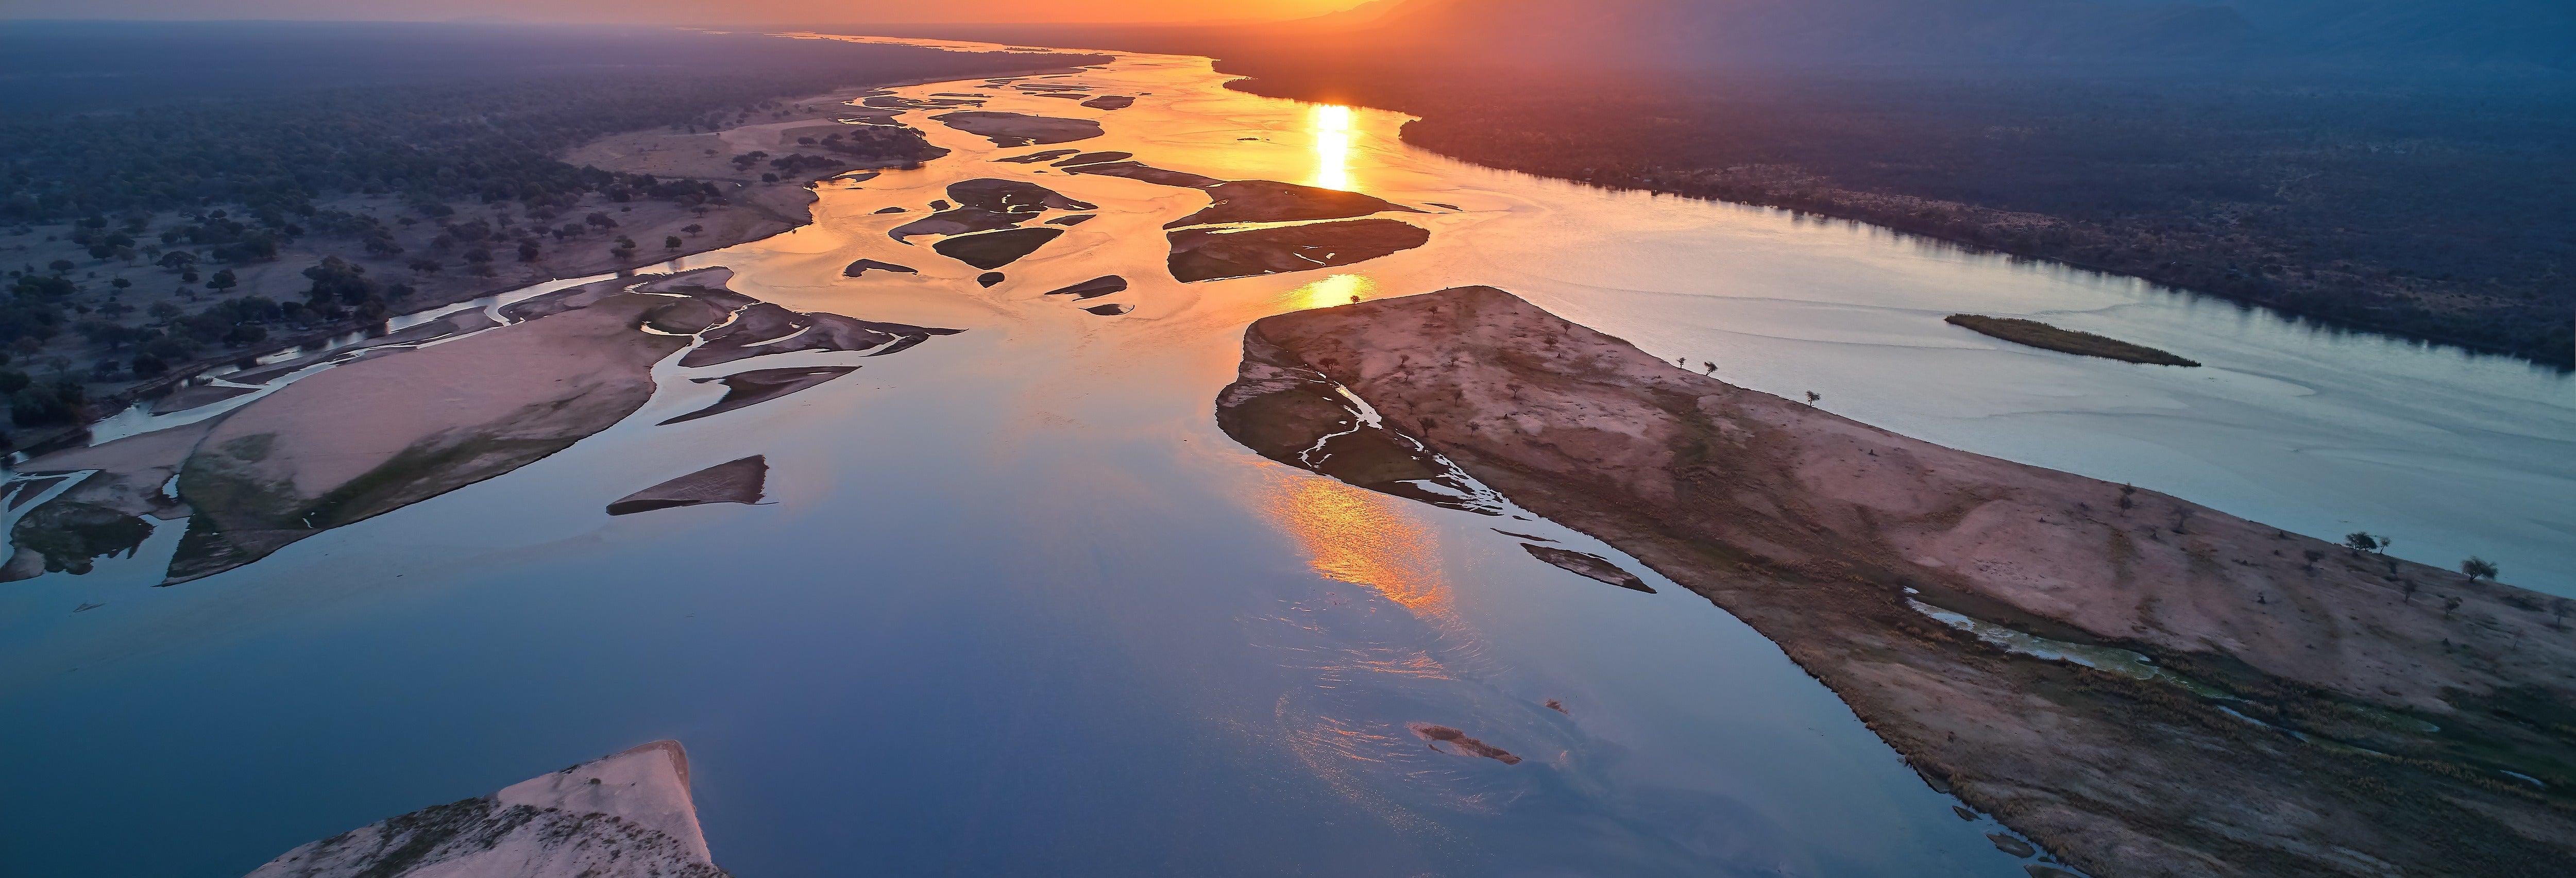 Passeio de barco ao entardecer pelo rio Zambezi